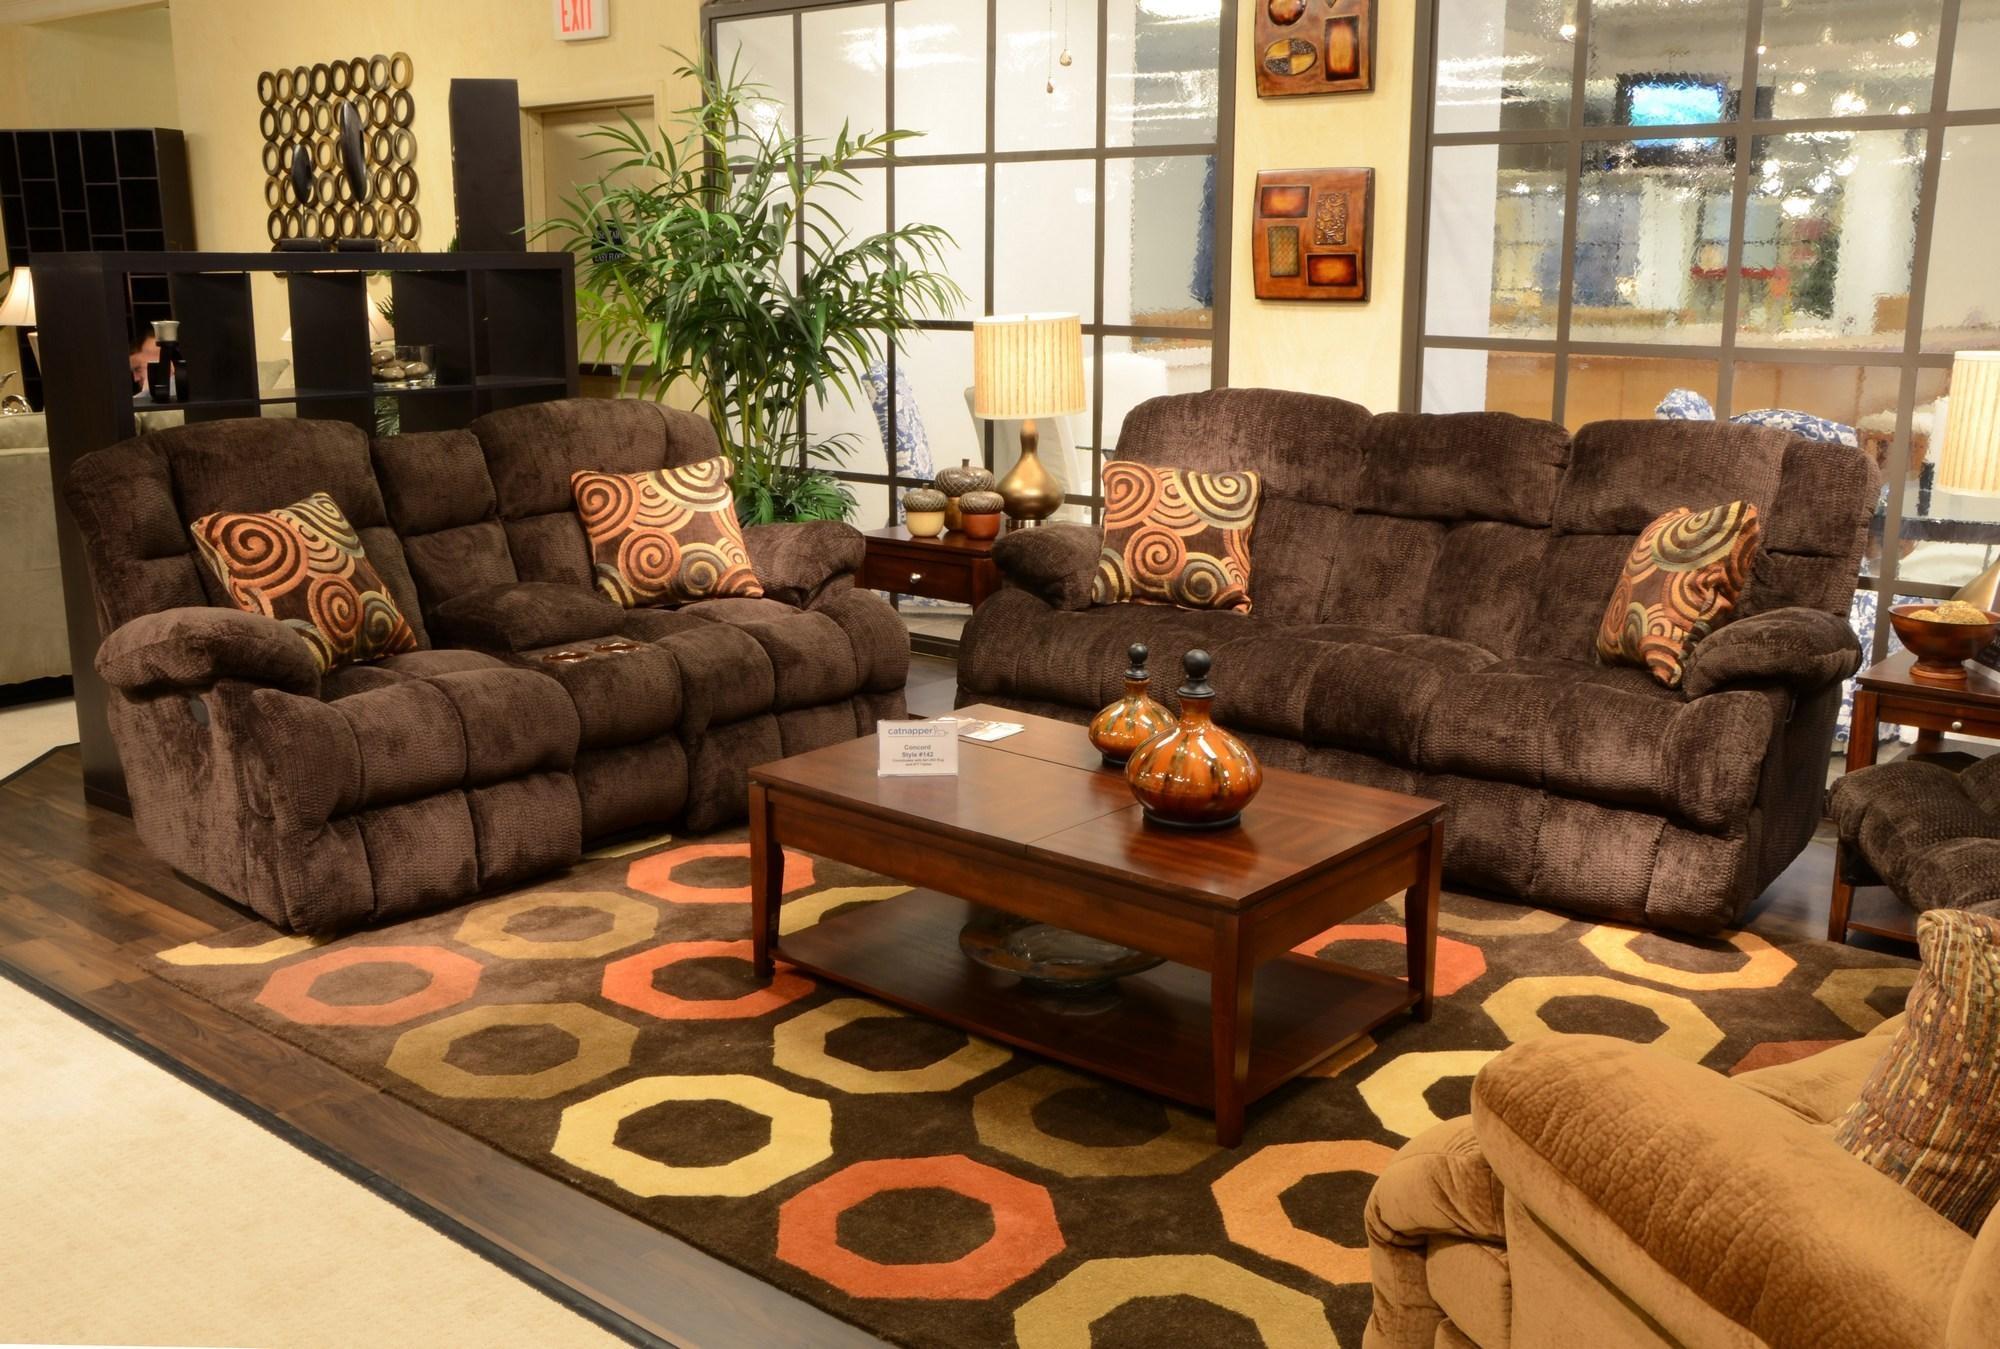 61421 | Catnapper Concord Concord | regarding Catnapper Reclining Sofas